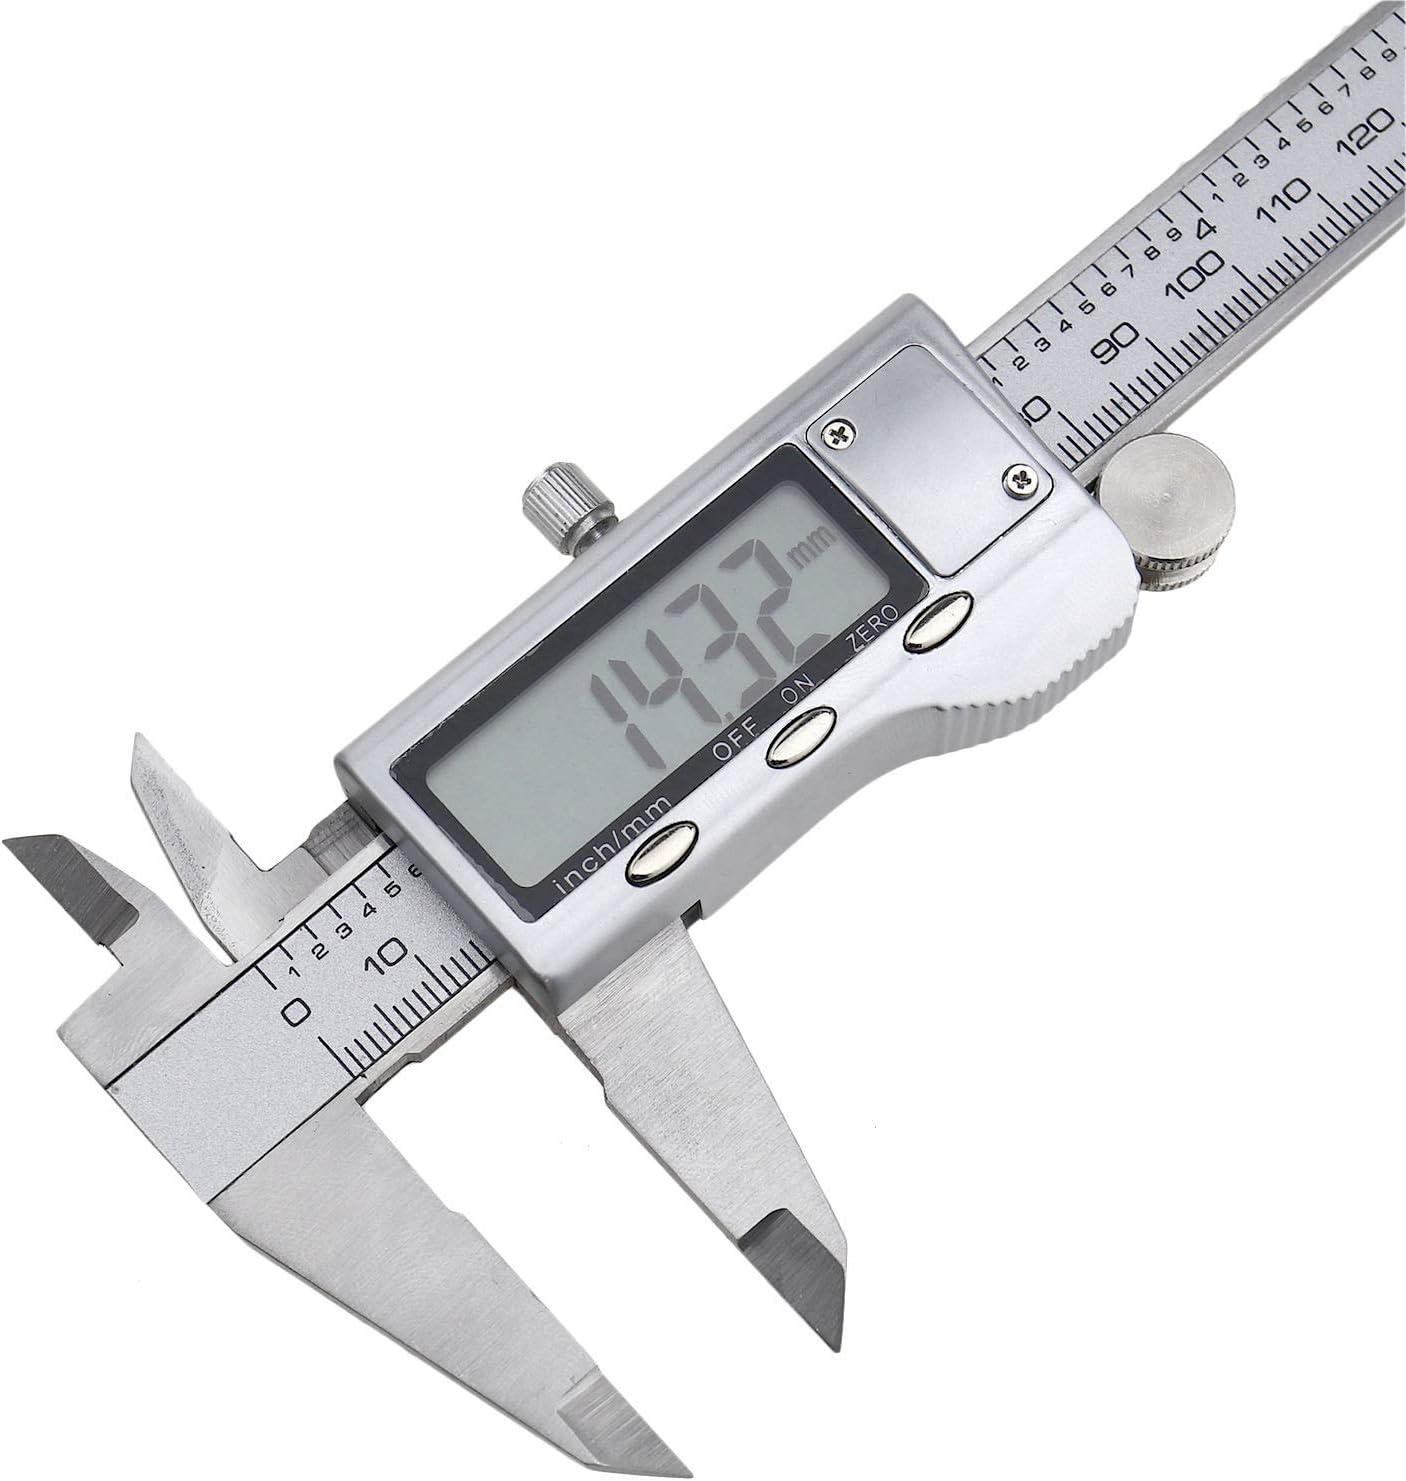 OTOTEC Digital Vernier Caliper Micrometer Stainless Steel Electronic Depth Gauge 150mm//6 Inch Conversion Measuring Tool